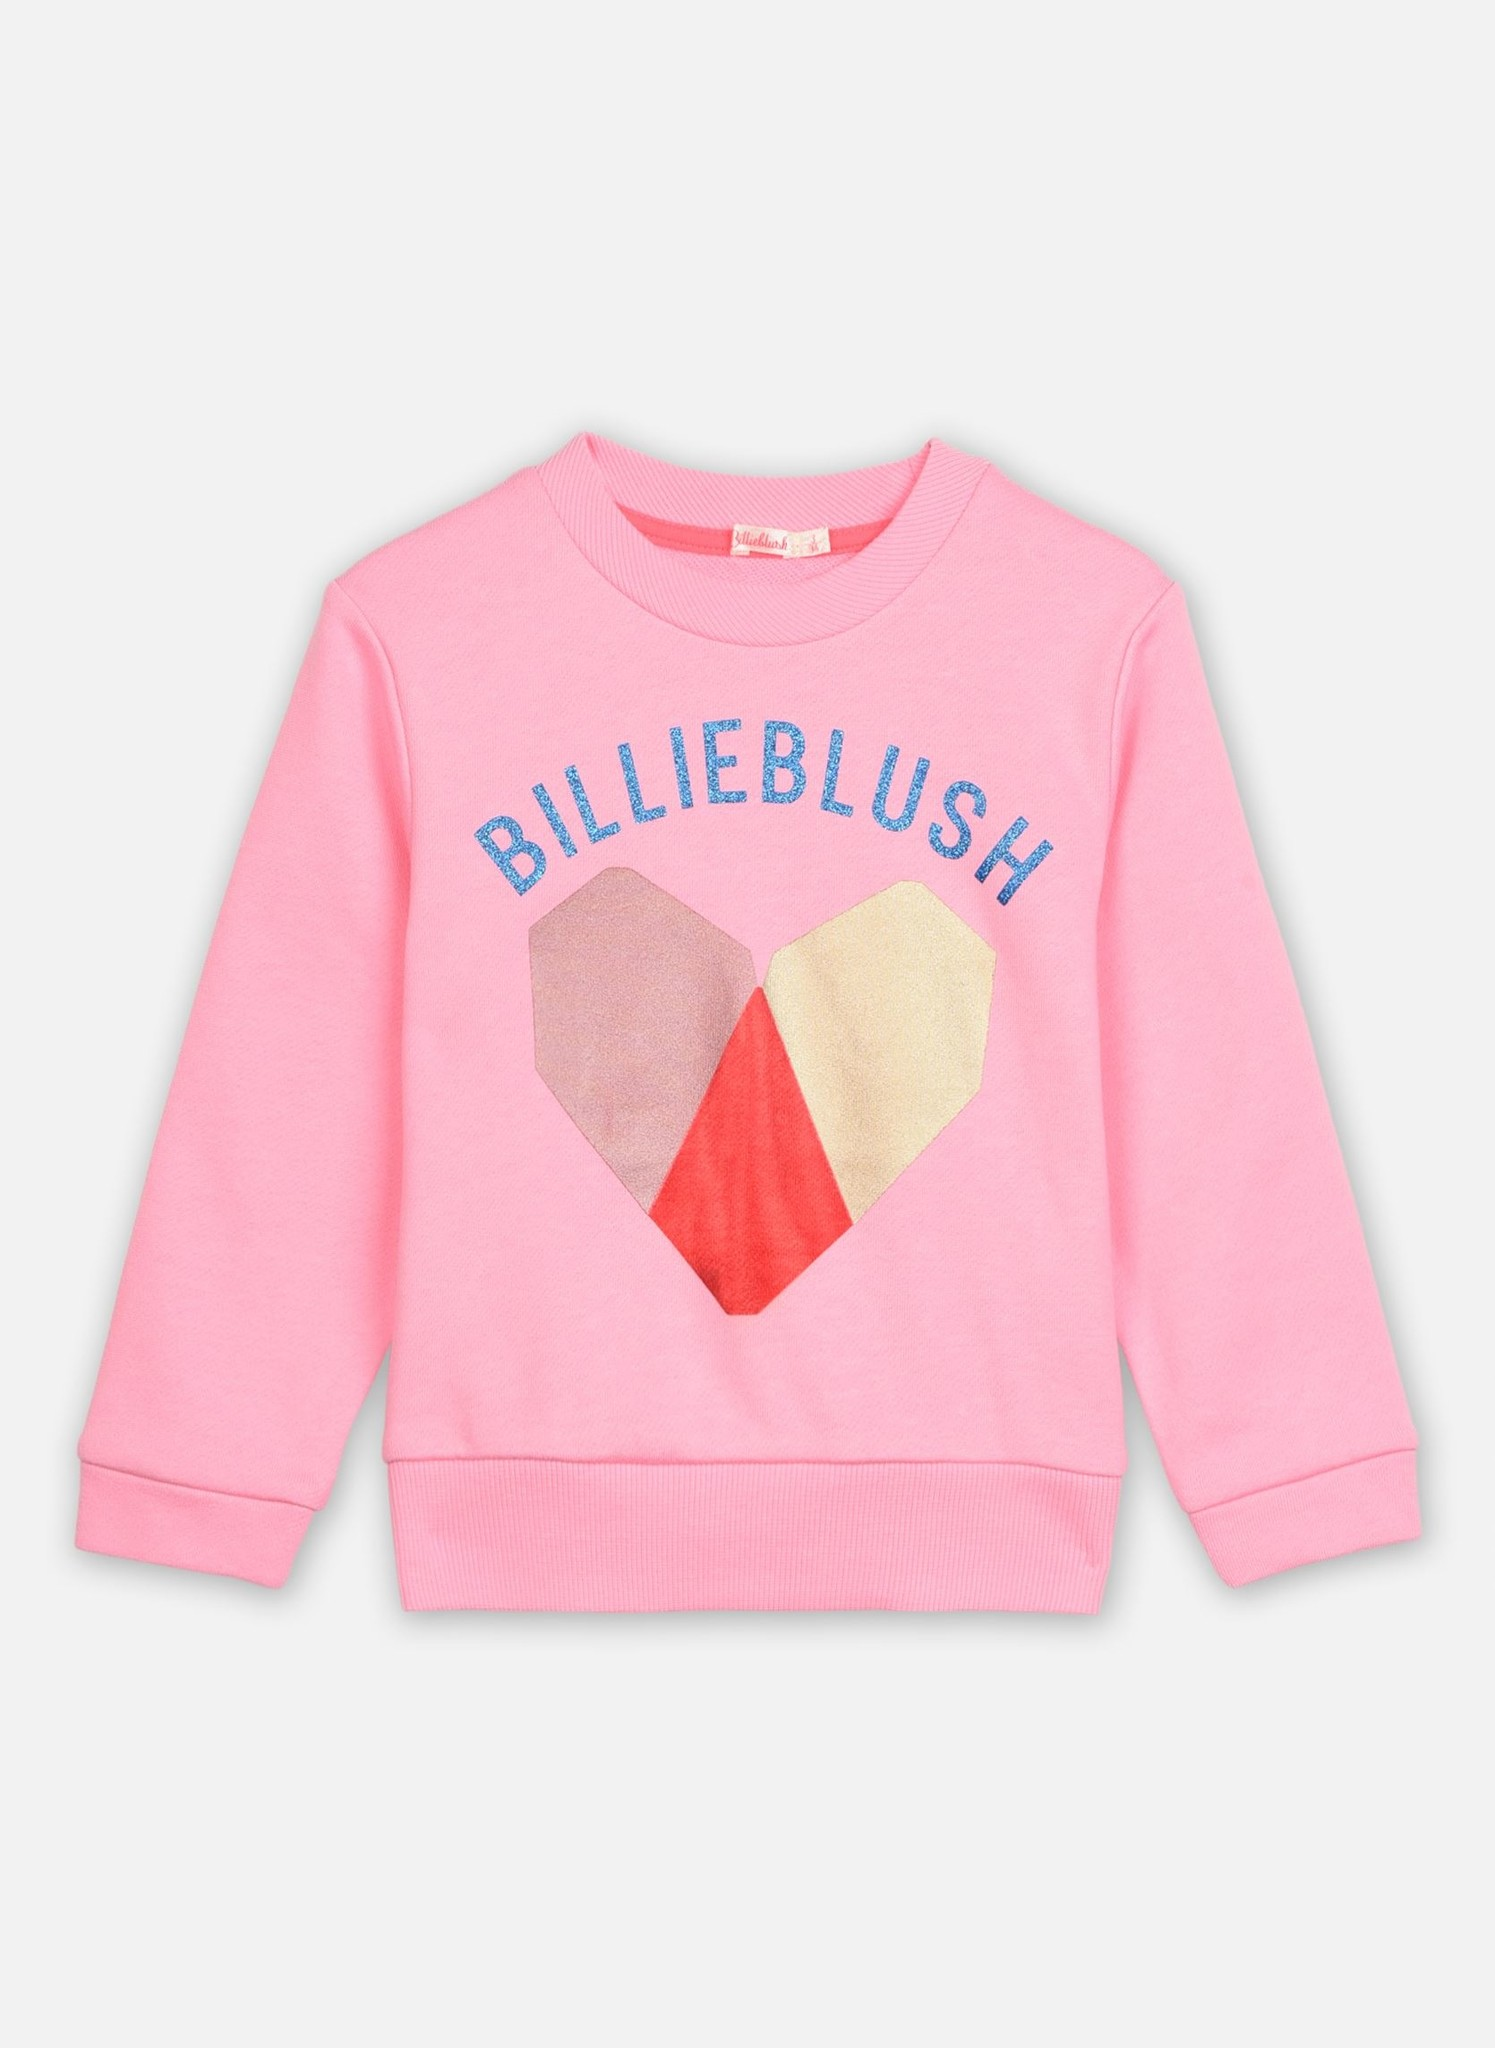 BILLIEBLUSH sweat rose-1